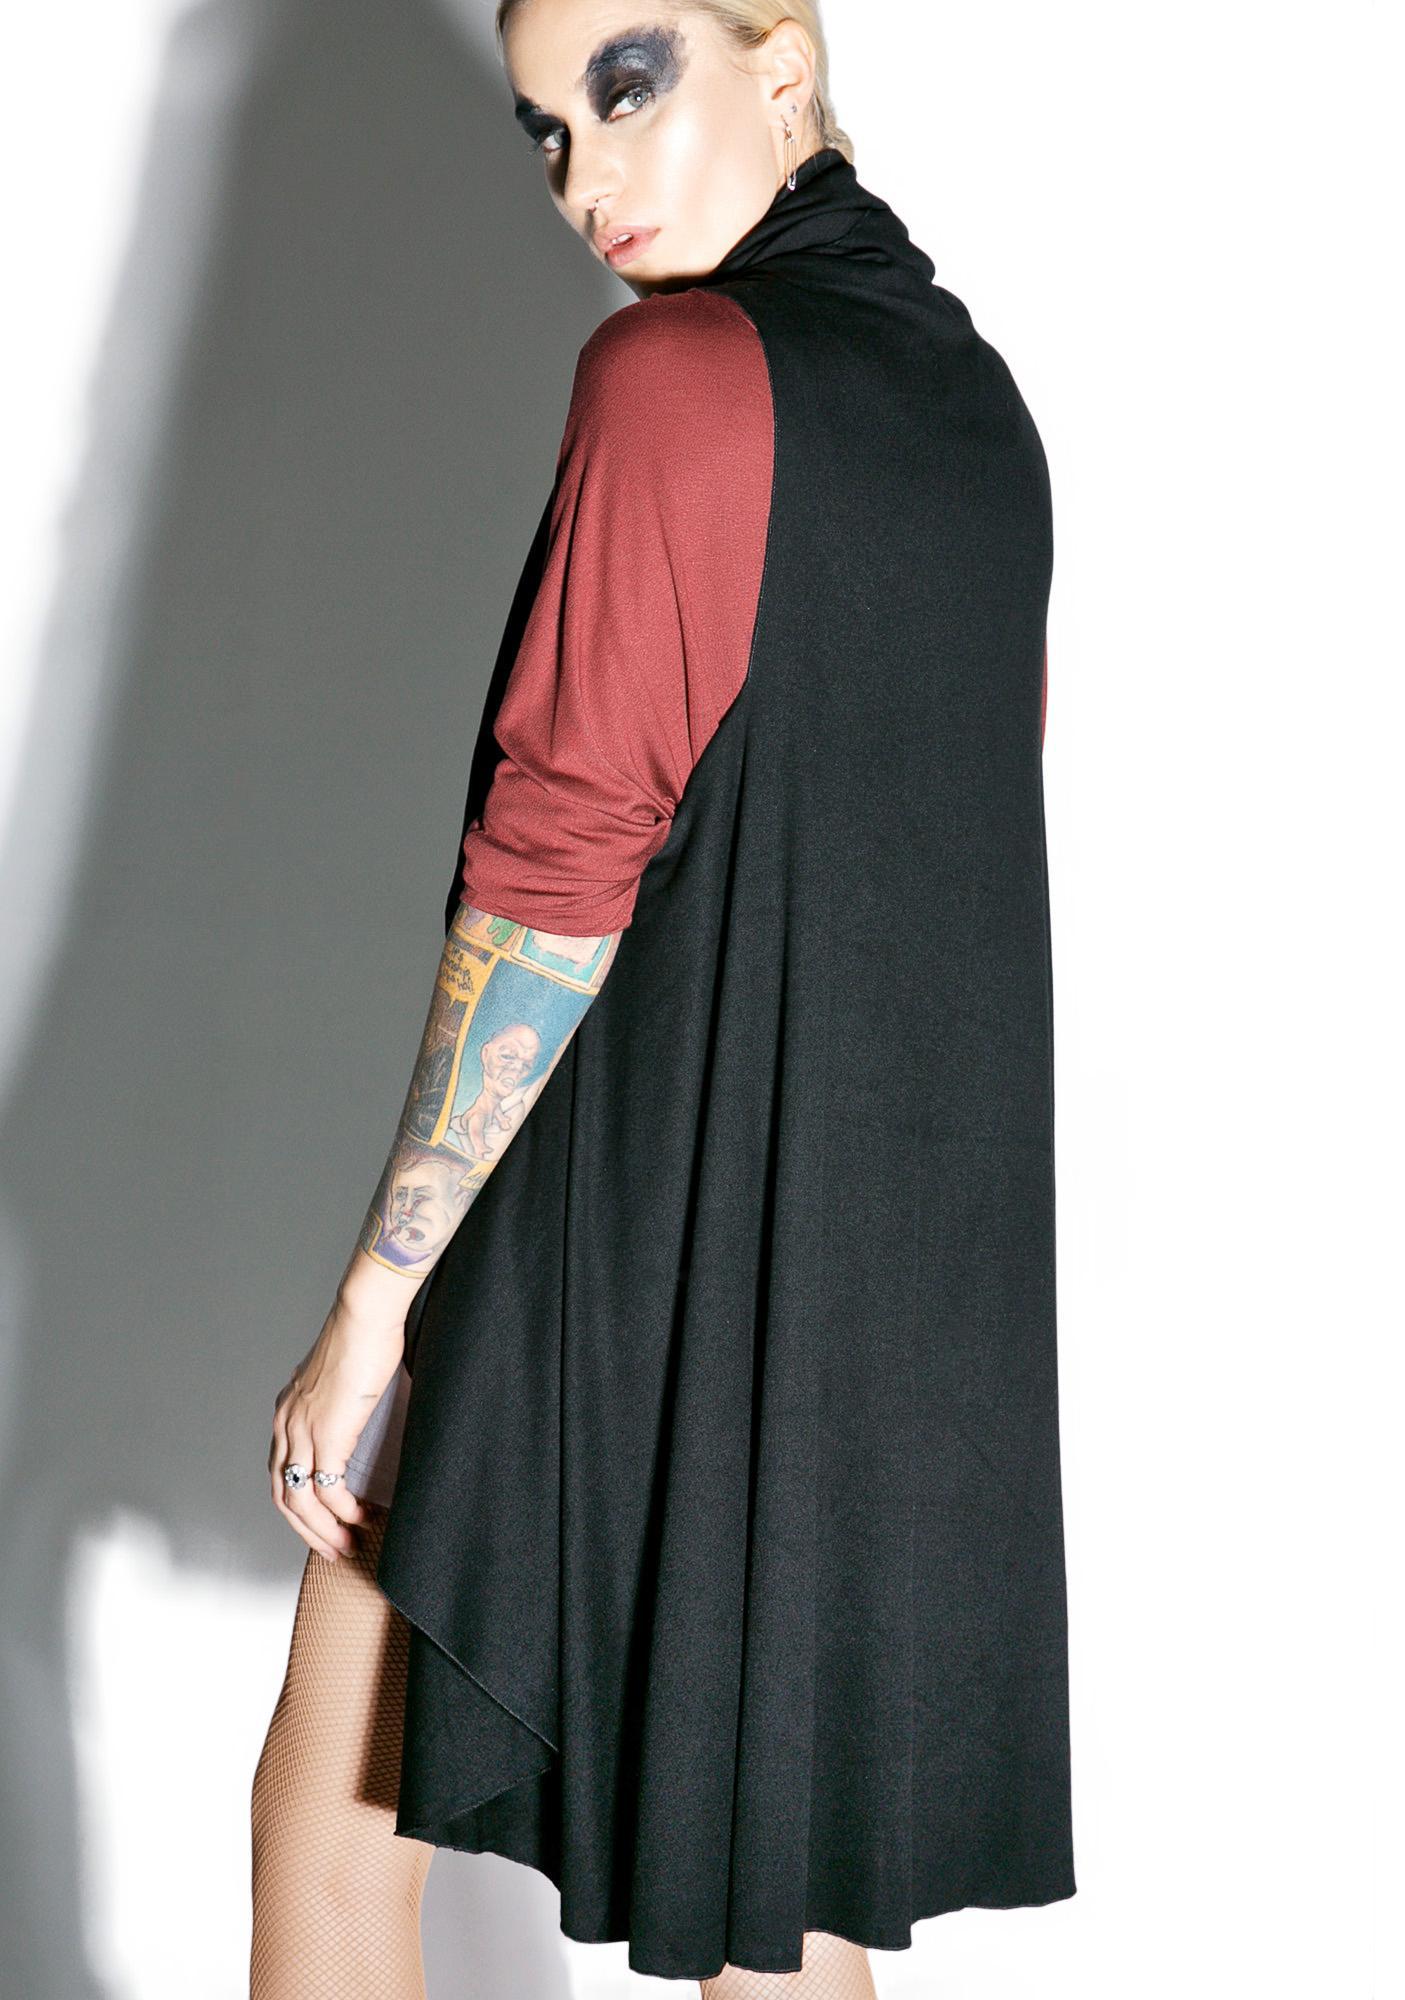 MNML Midnight Shadow Sleeveless Hooded Cardigan | Dolls Kill